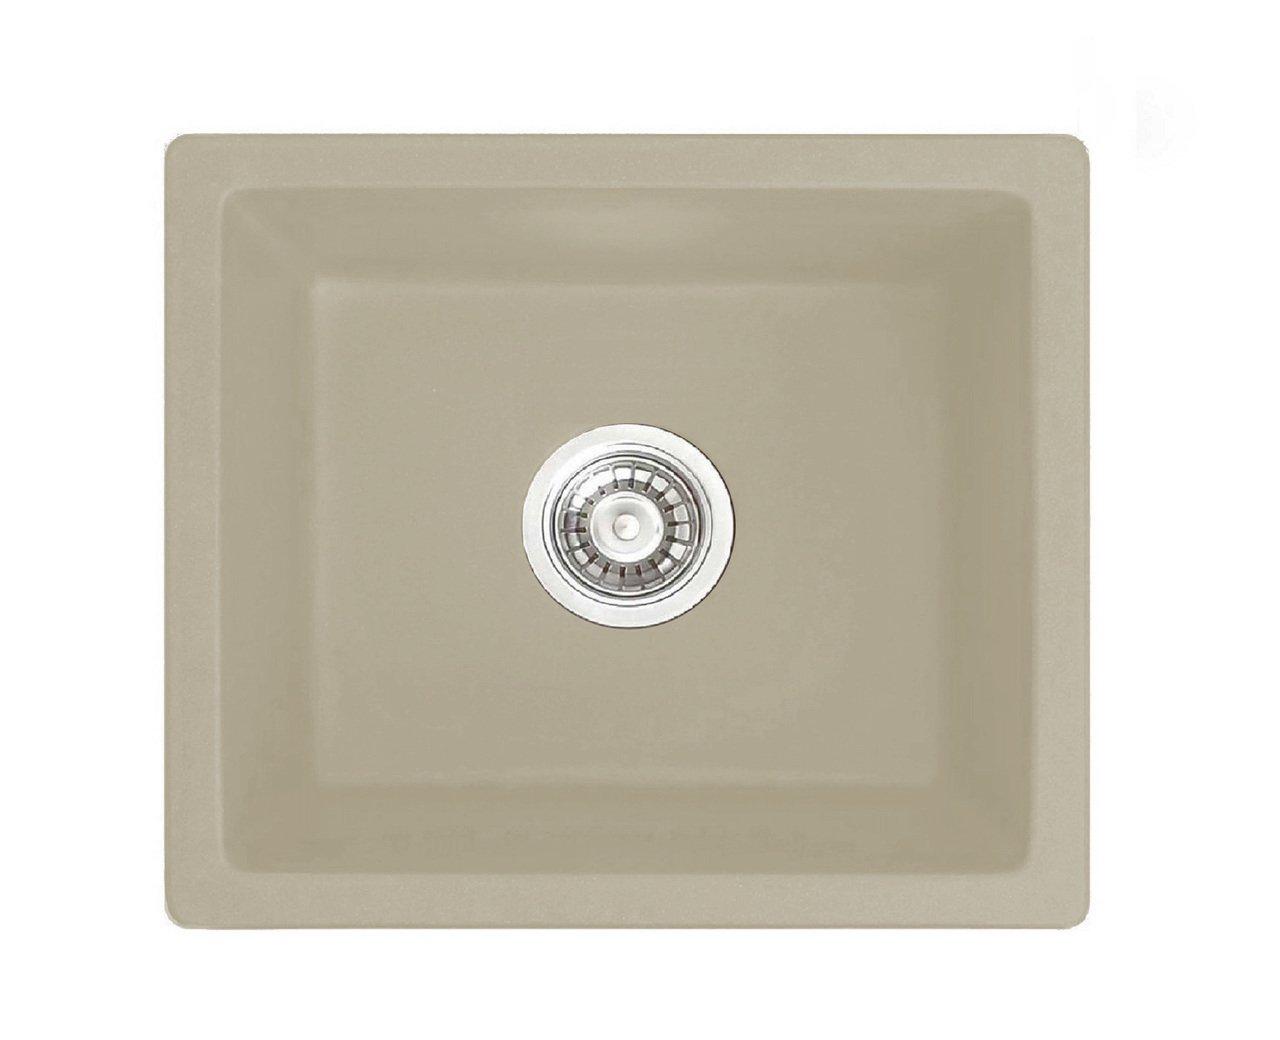 LOTTARE 700103 Undermount Composite Granite Bar Sink Wheat